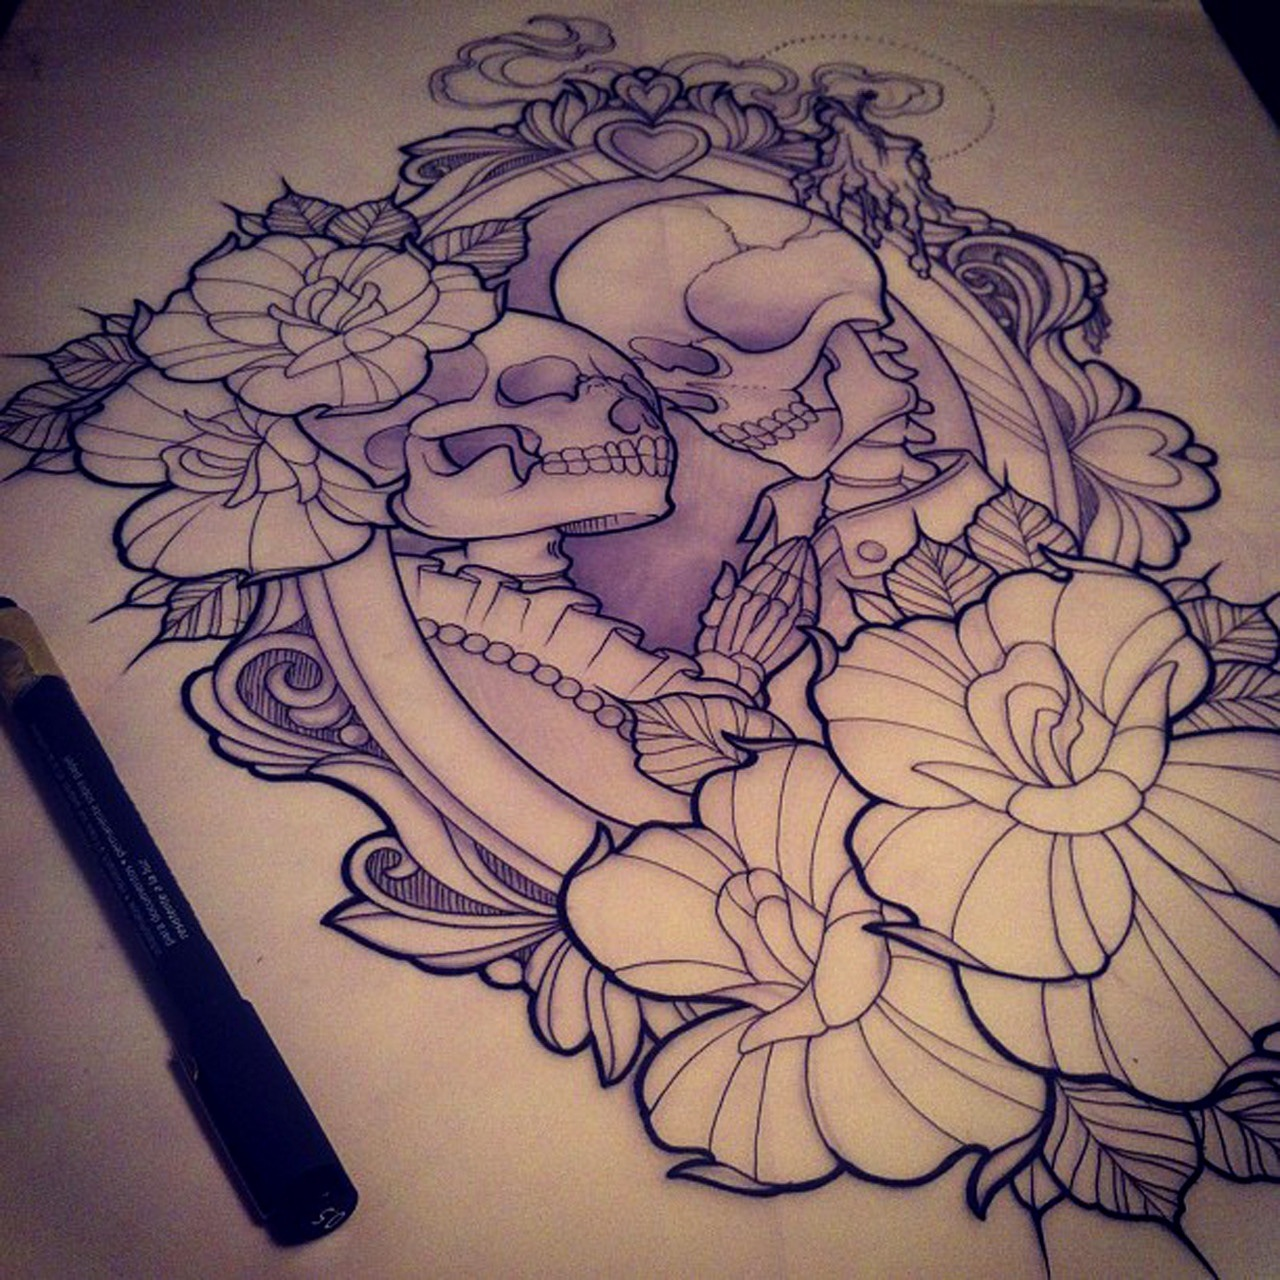 Tattoos Tumblr Blog Tattoo Blog